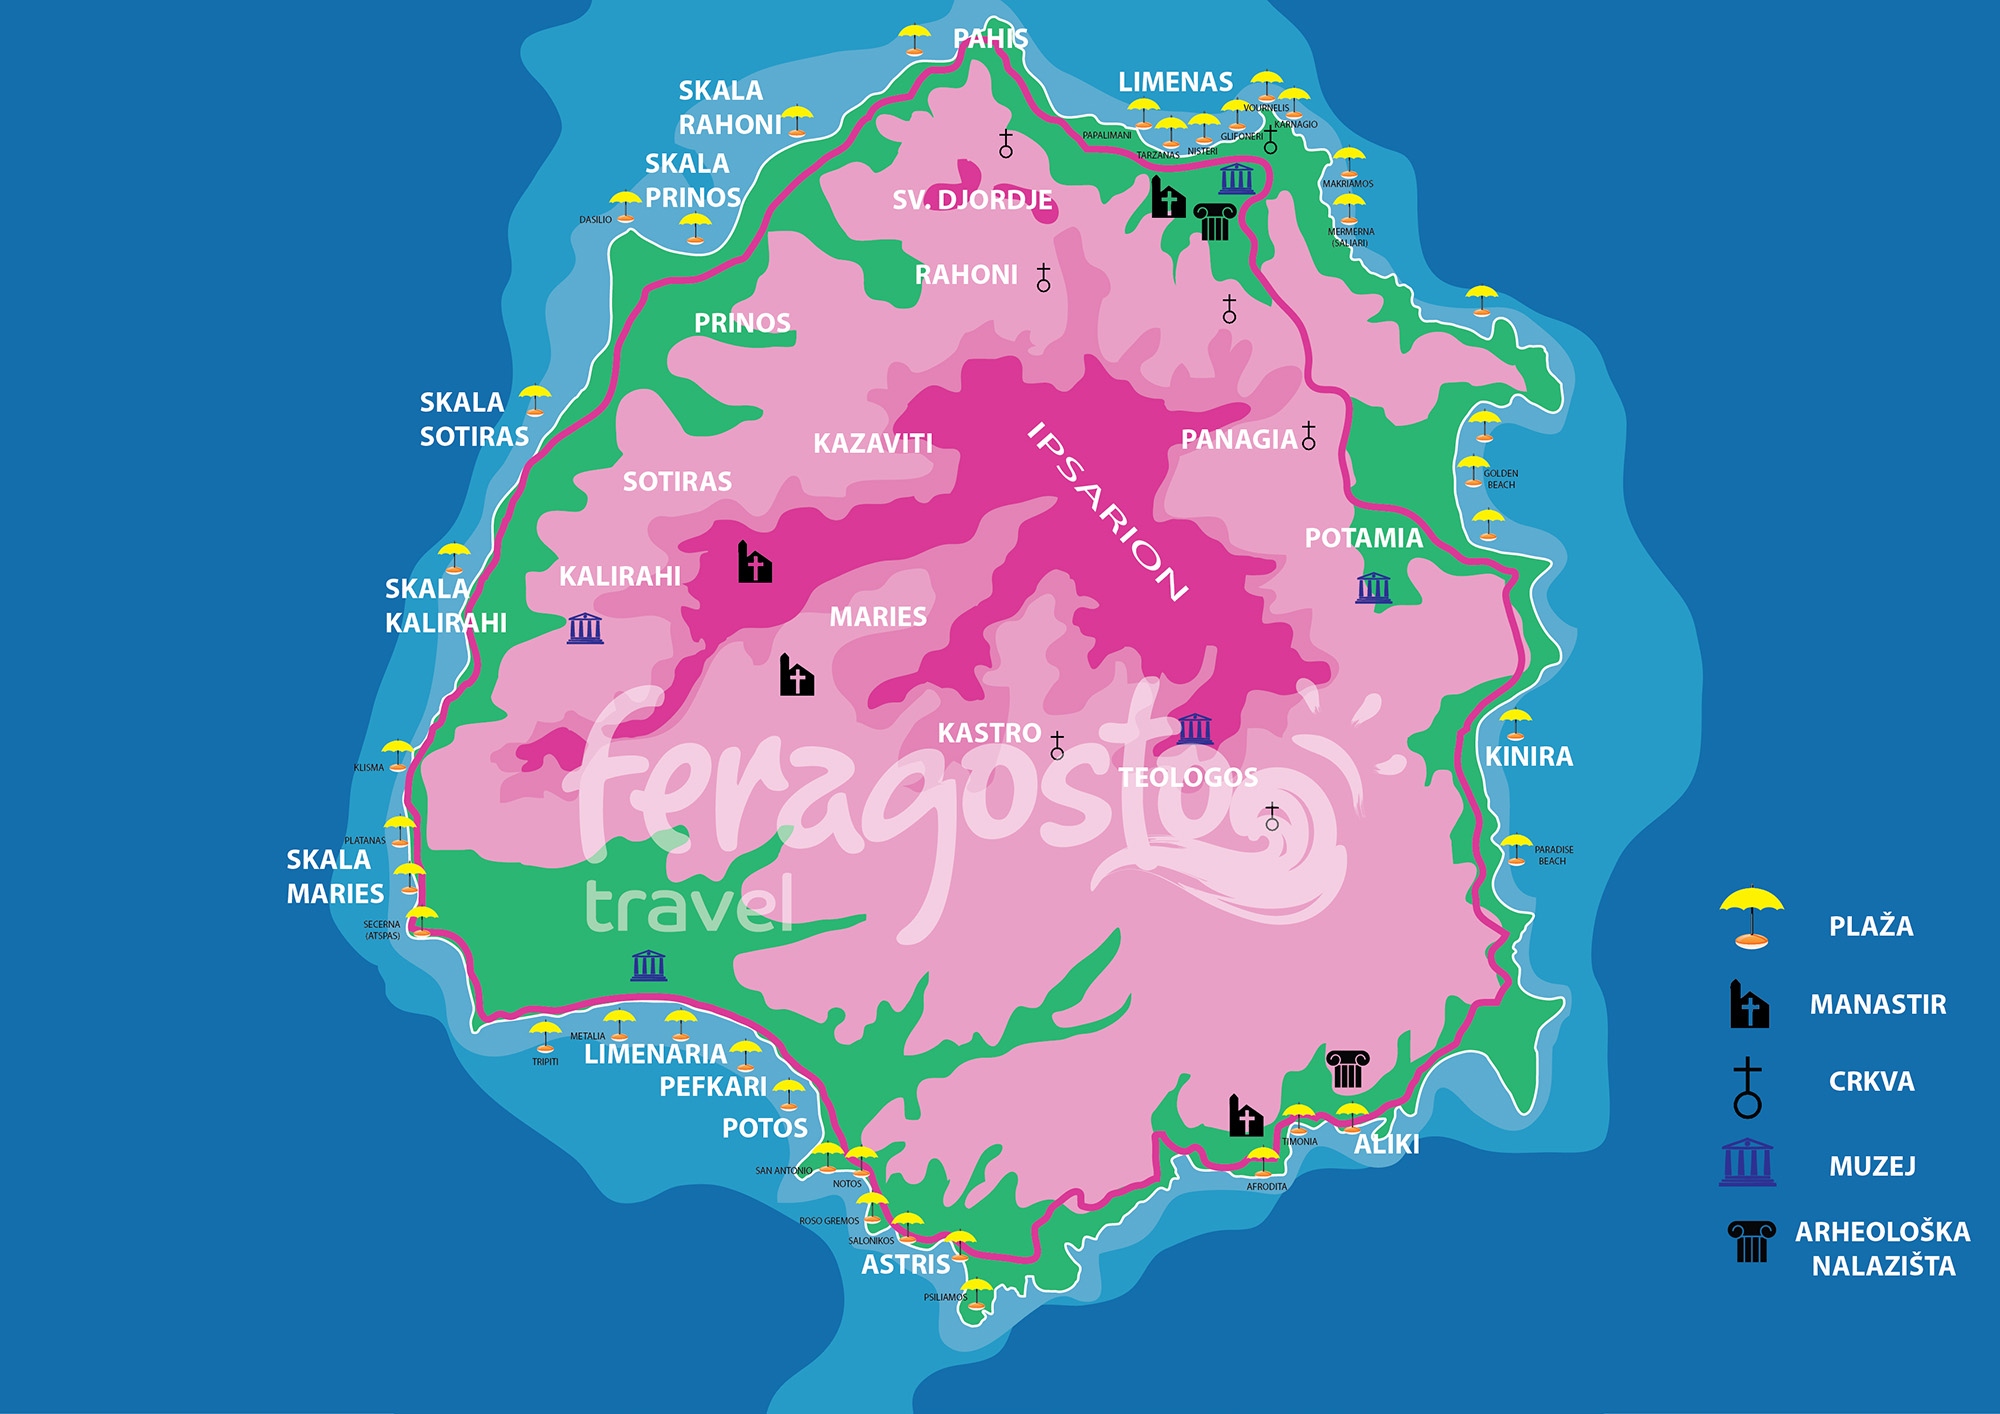 TASOS mapa